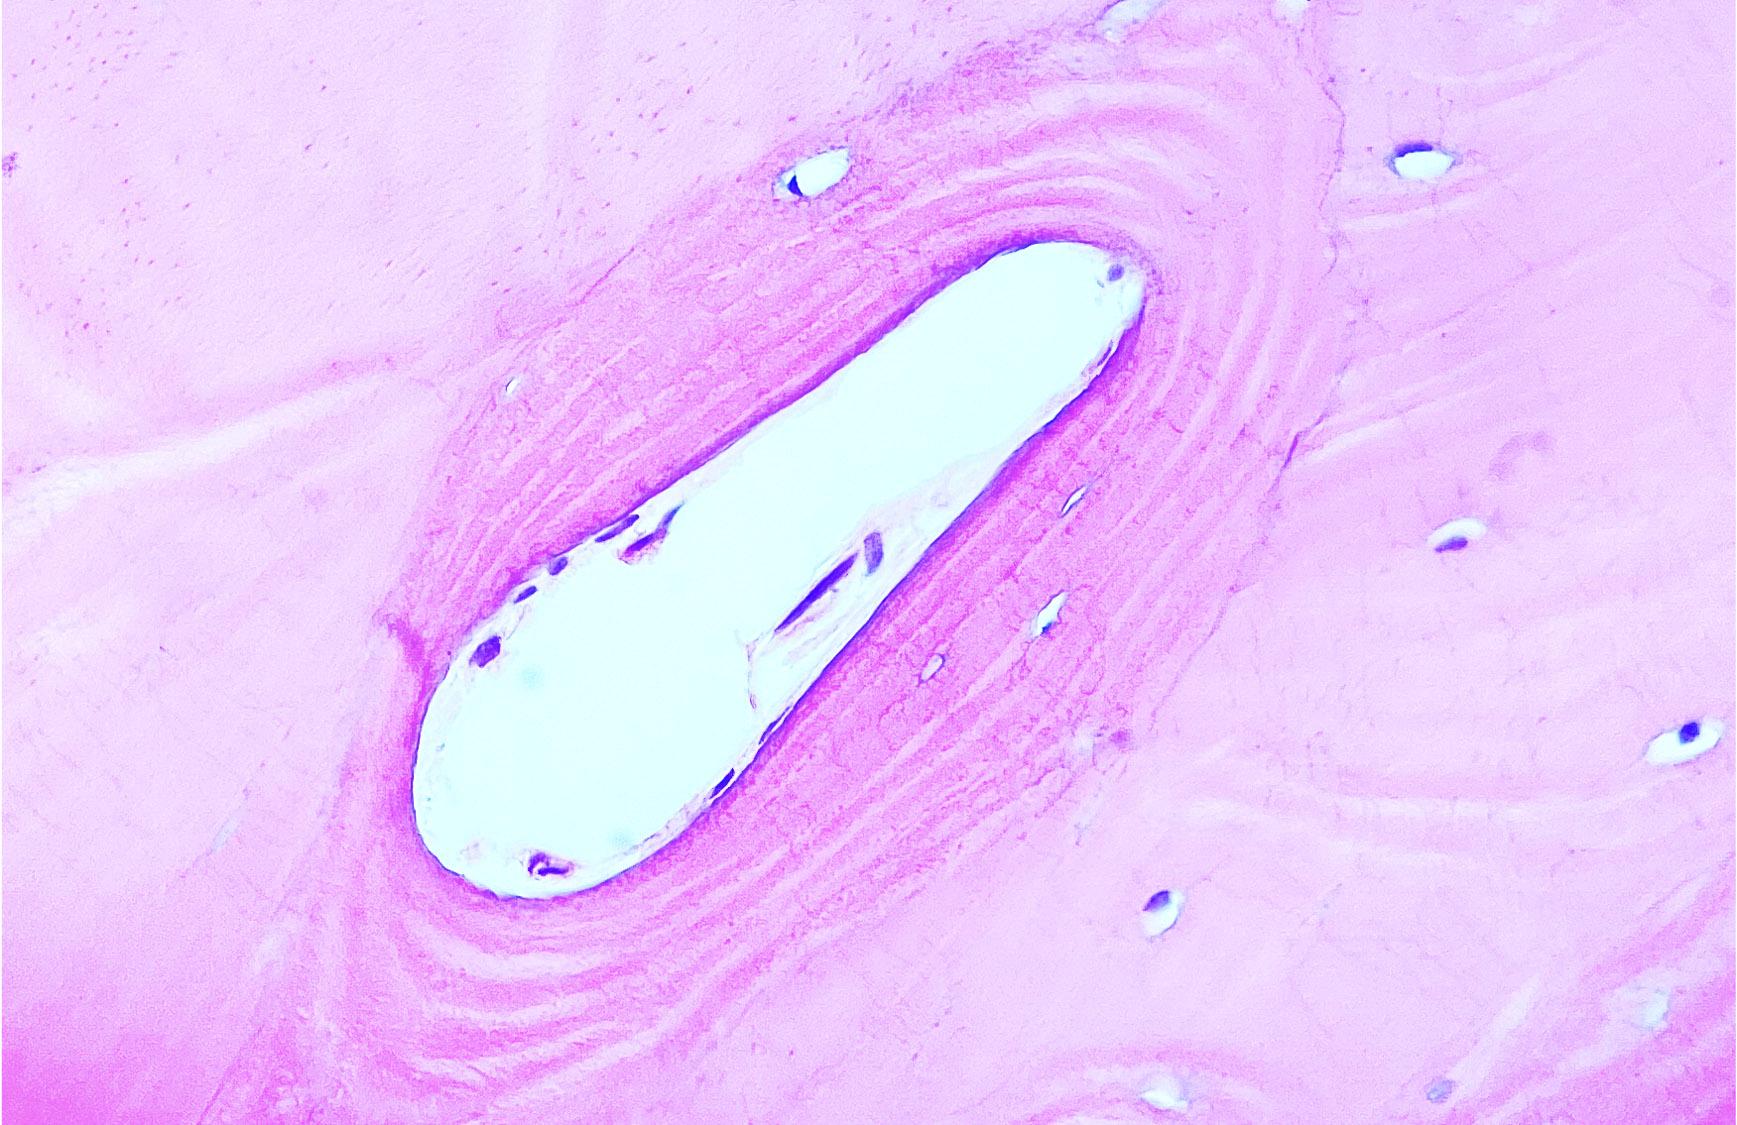 Osteoblasts and osteocytes